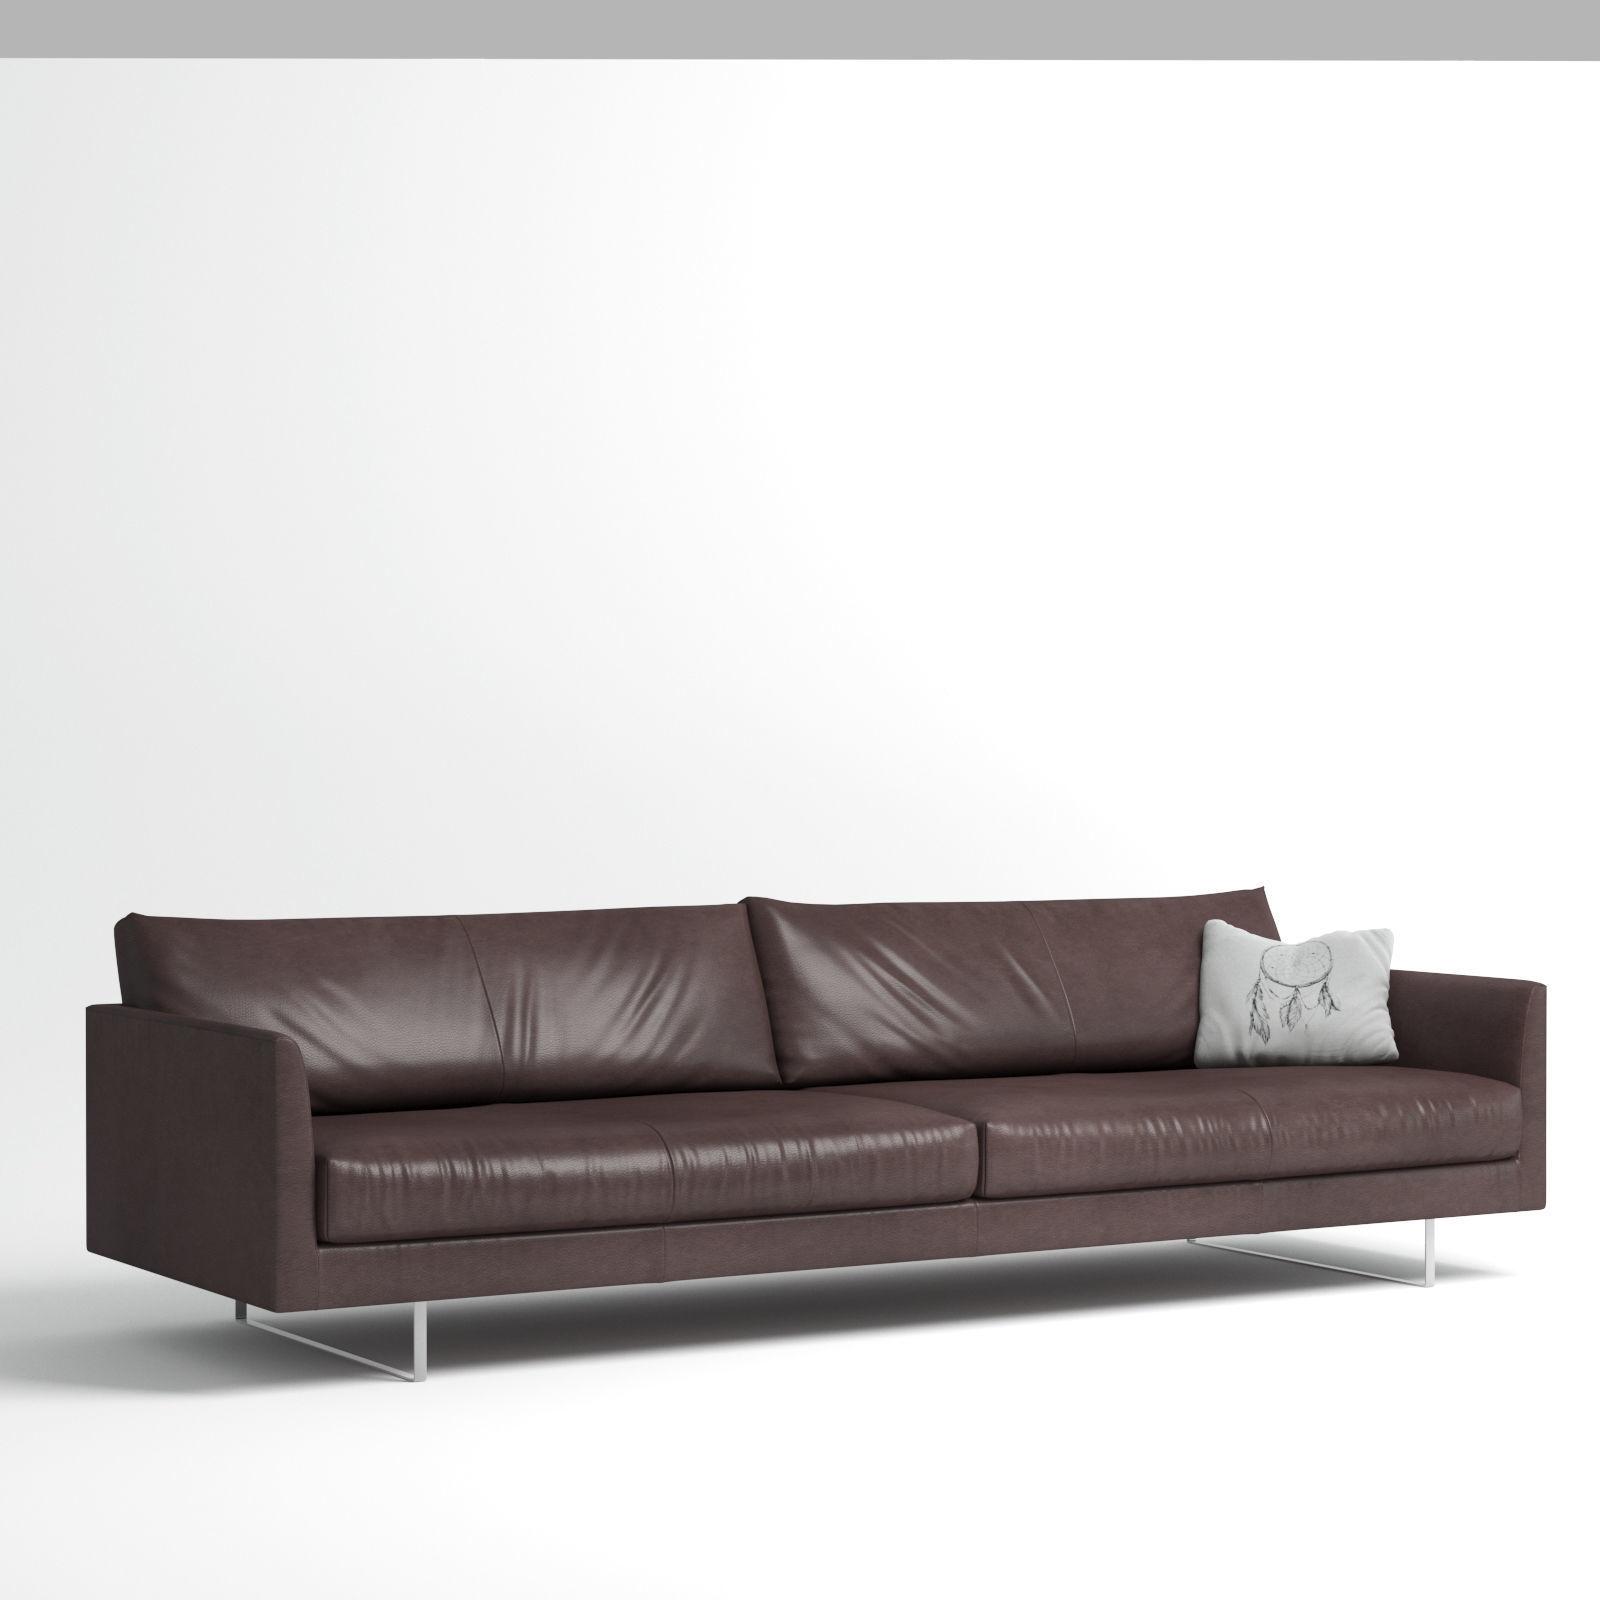 axel-5-seat-sofa-gijs-papavoine-montis 3D   CGTrader